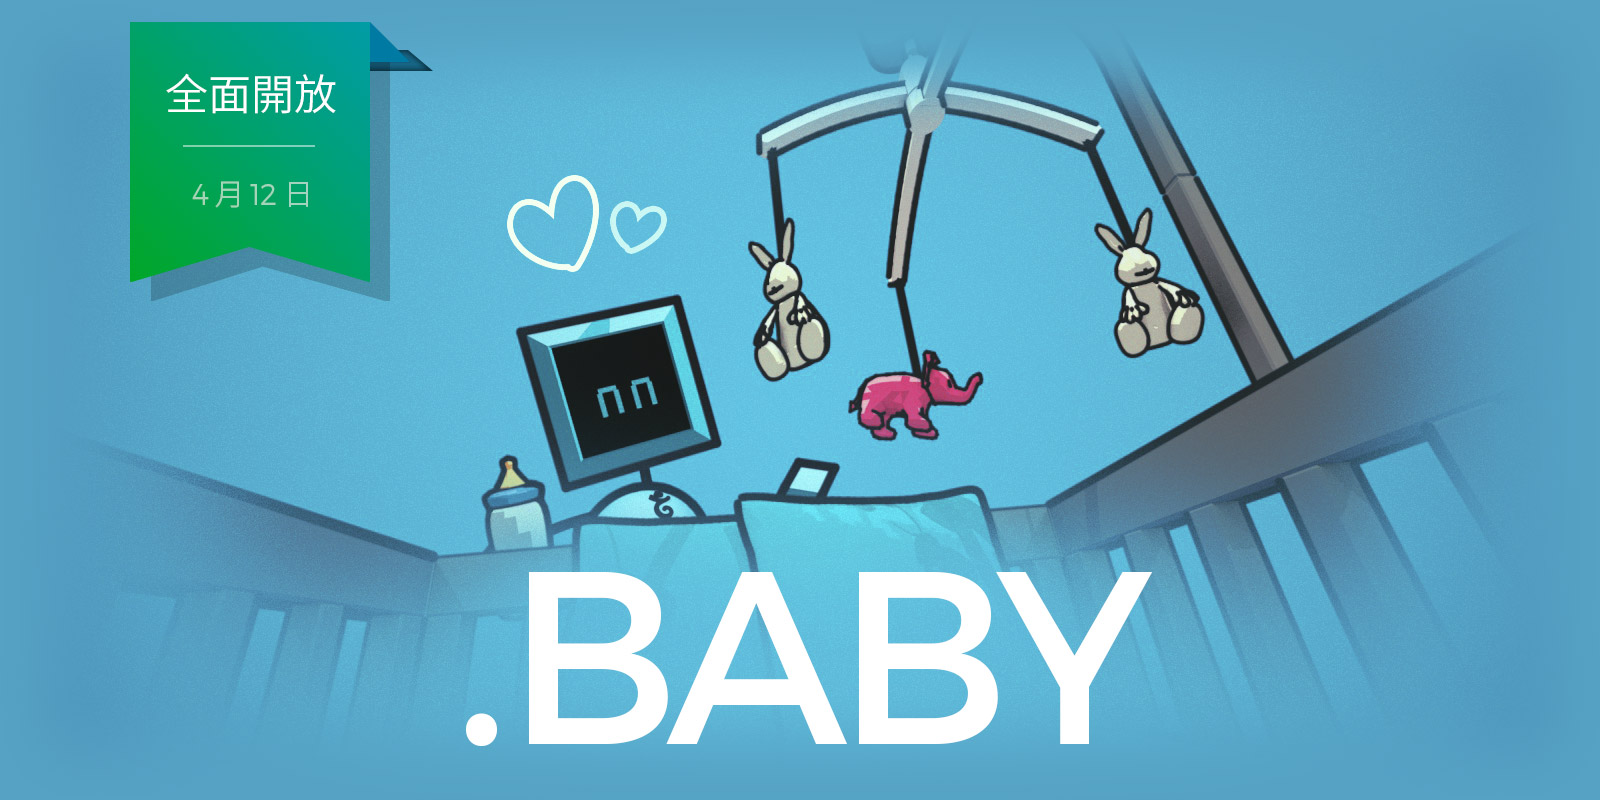 .BABY 域名即將全面開放註冊